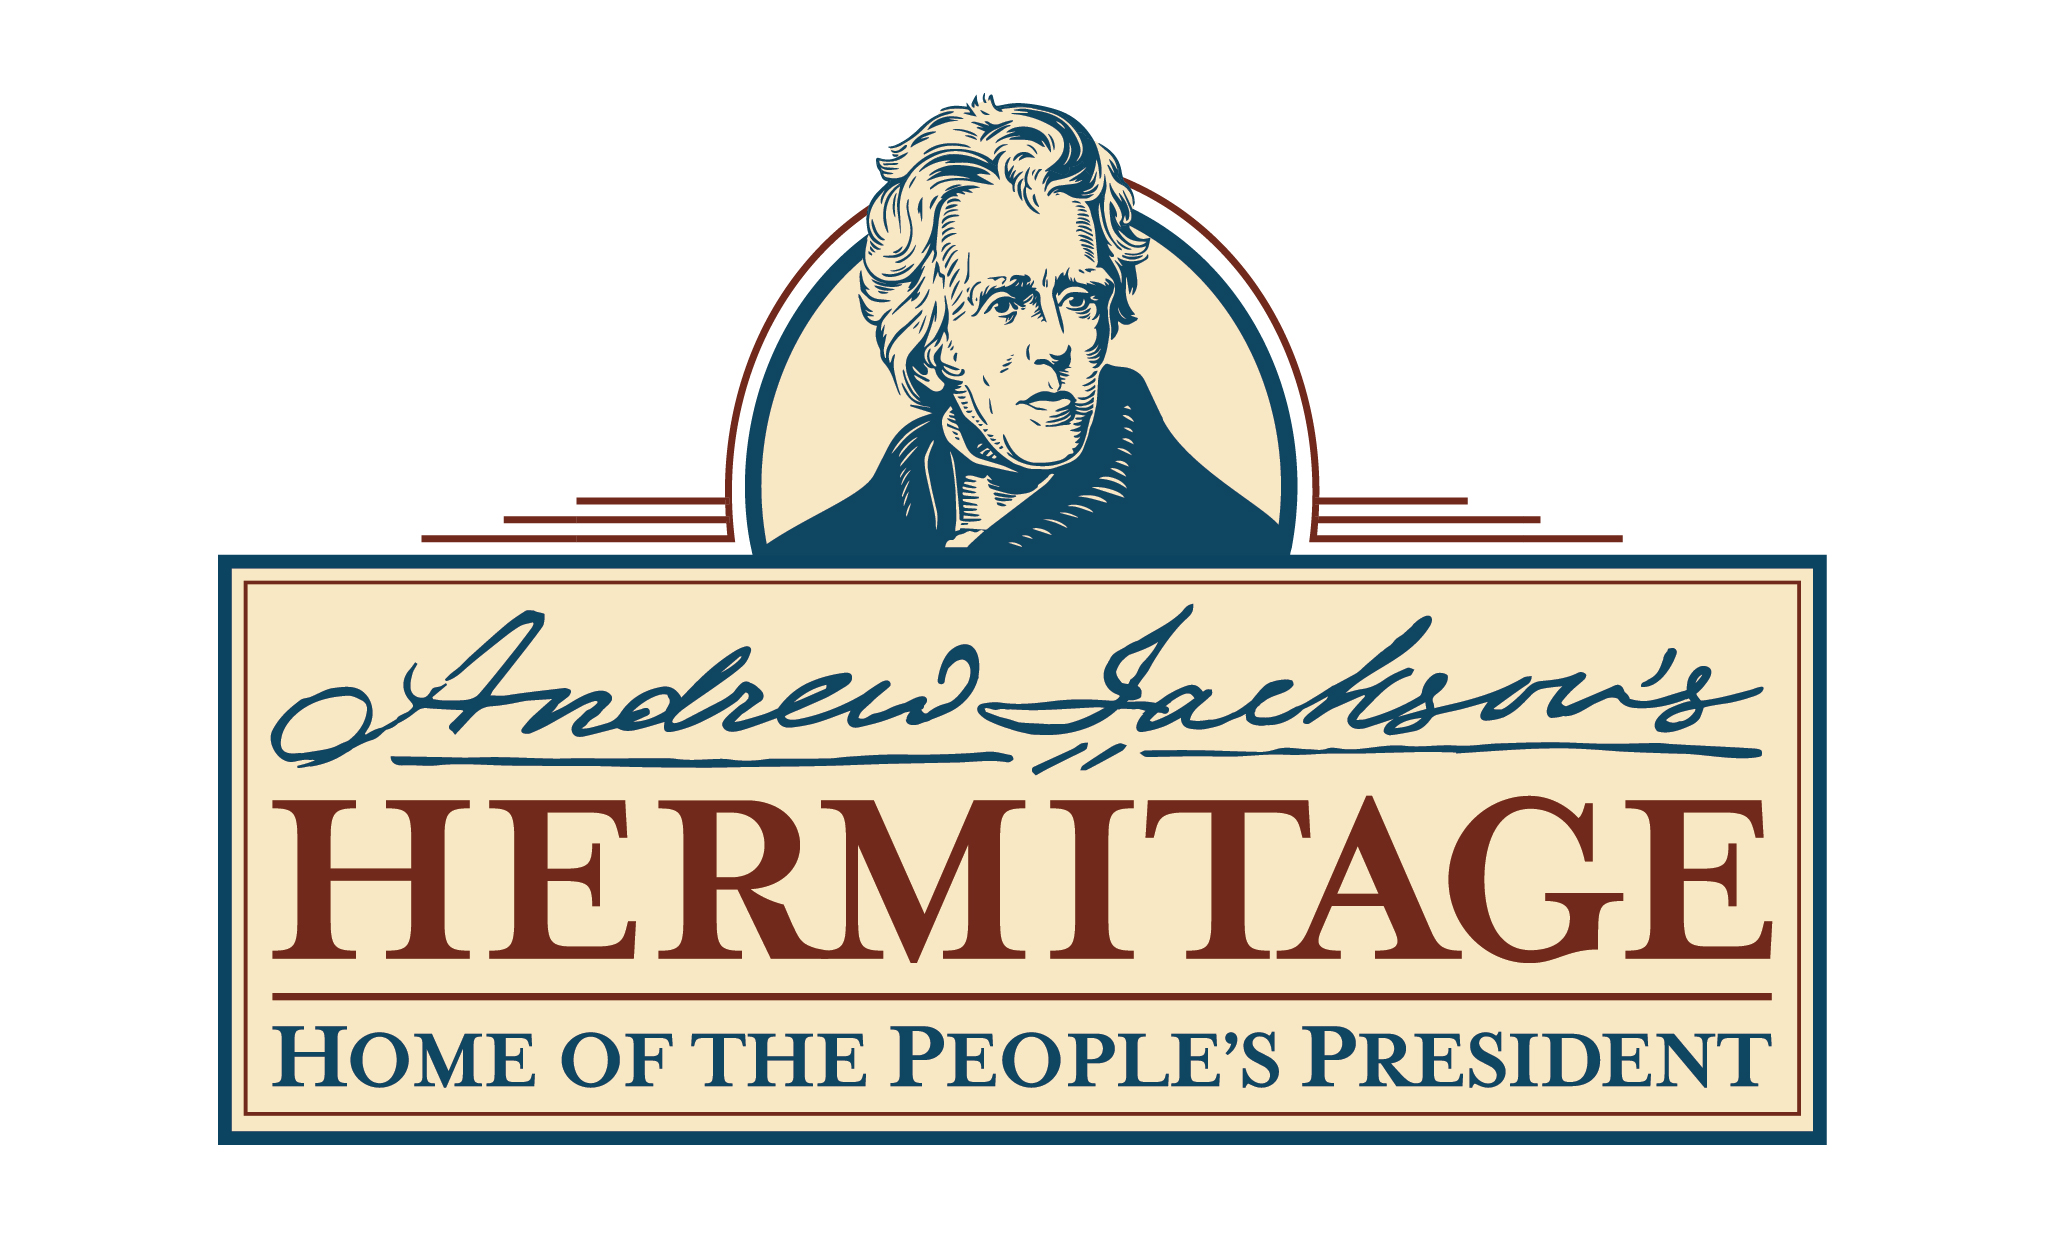 hermitage centered logo background-01.jpg